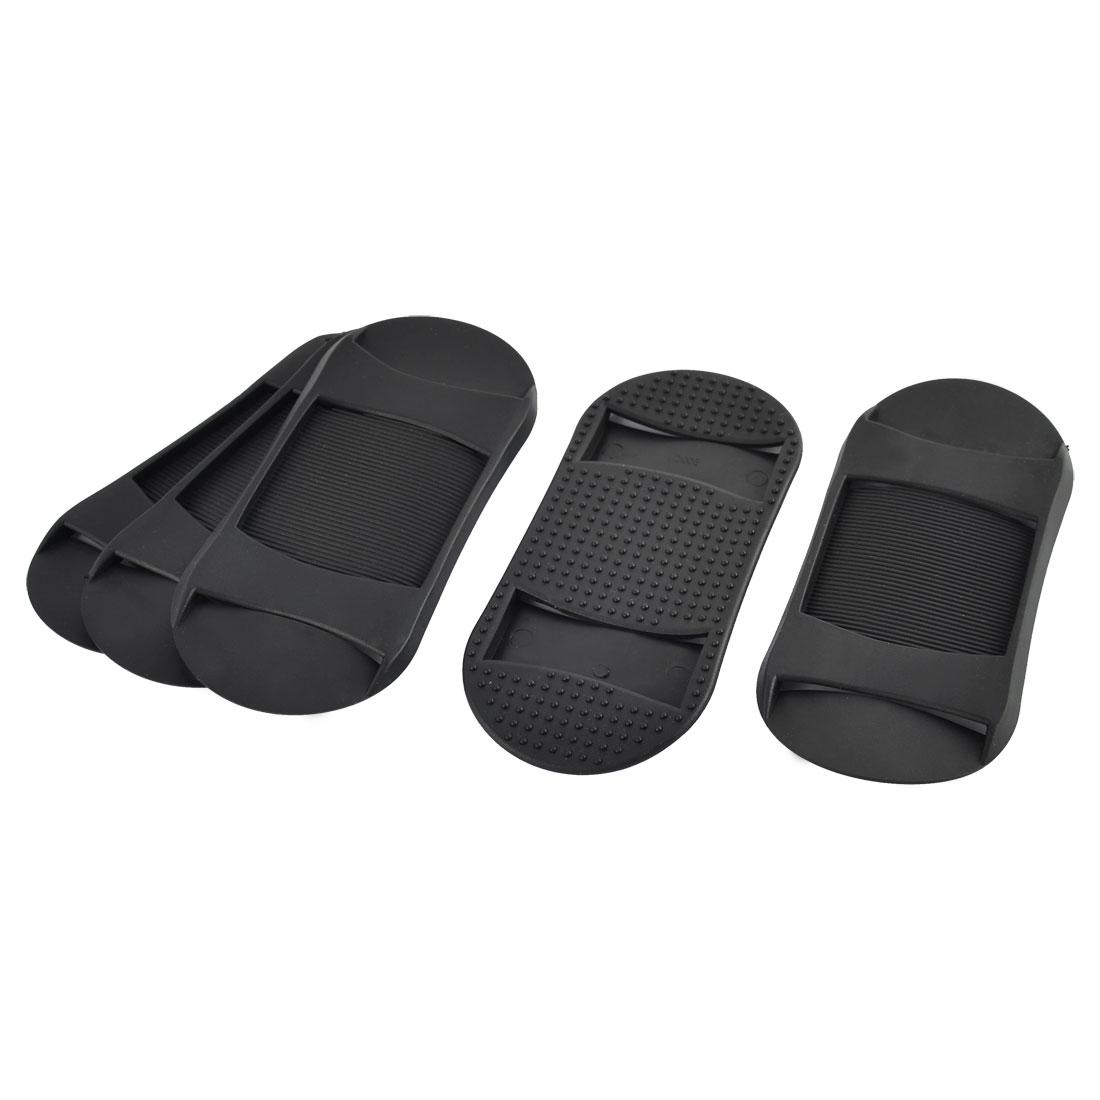 Backpack Suitcase Plastic Anti-slip Replacement Shoulder Bag Strap Pads Black 5pcs